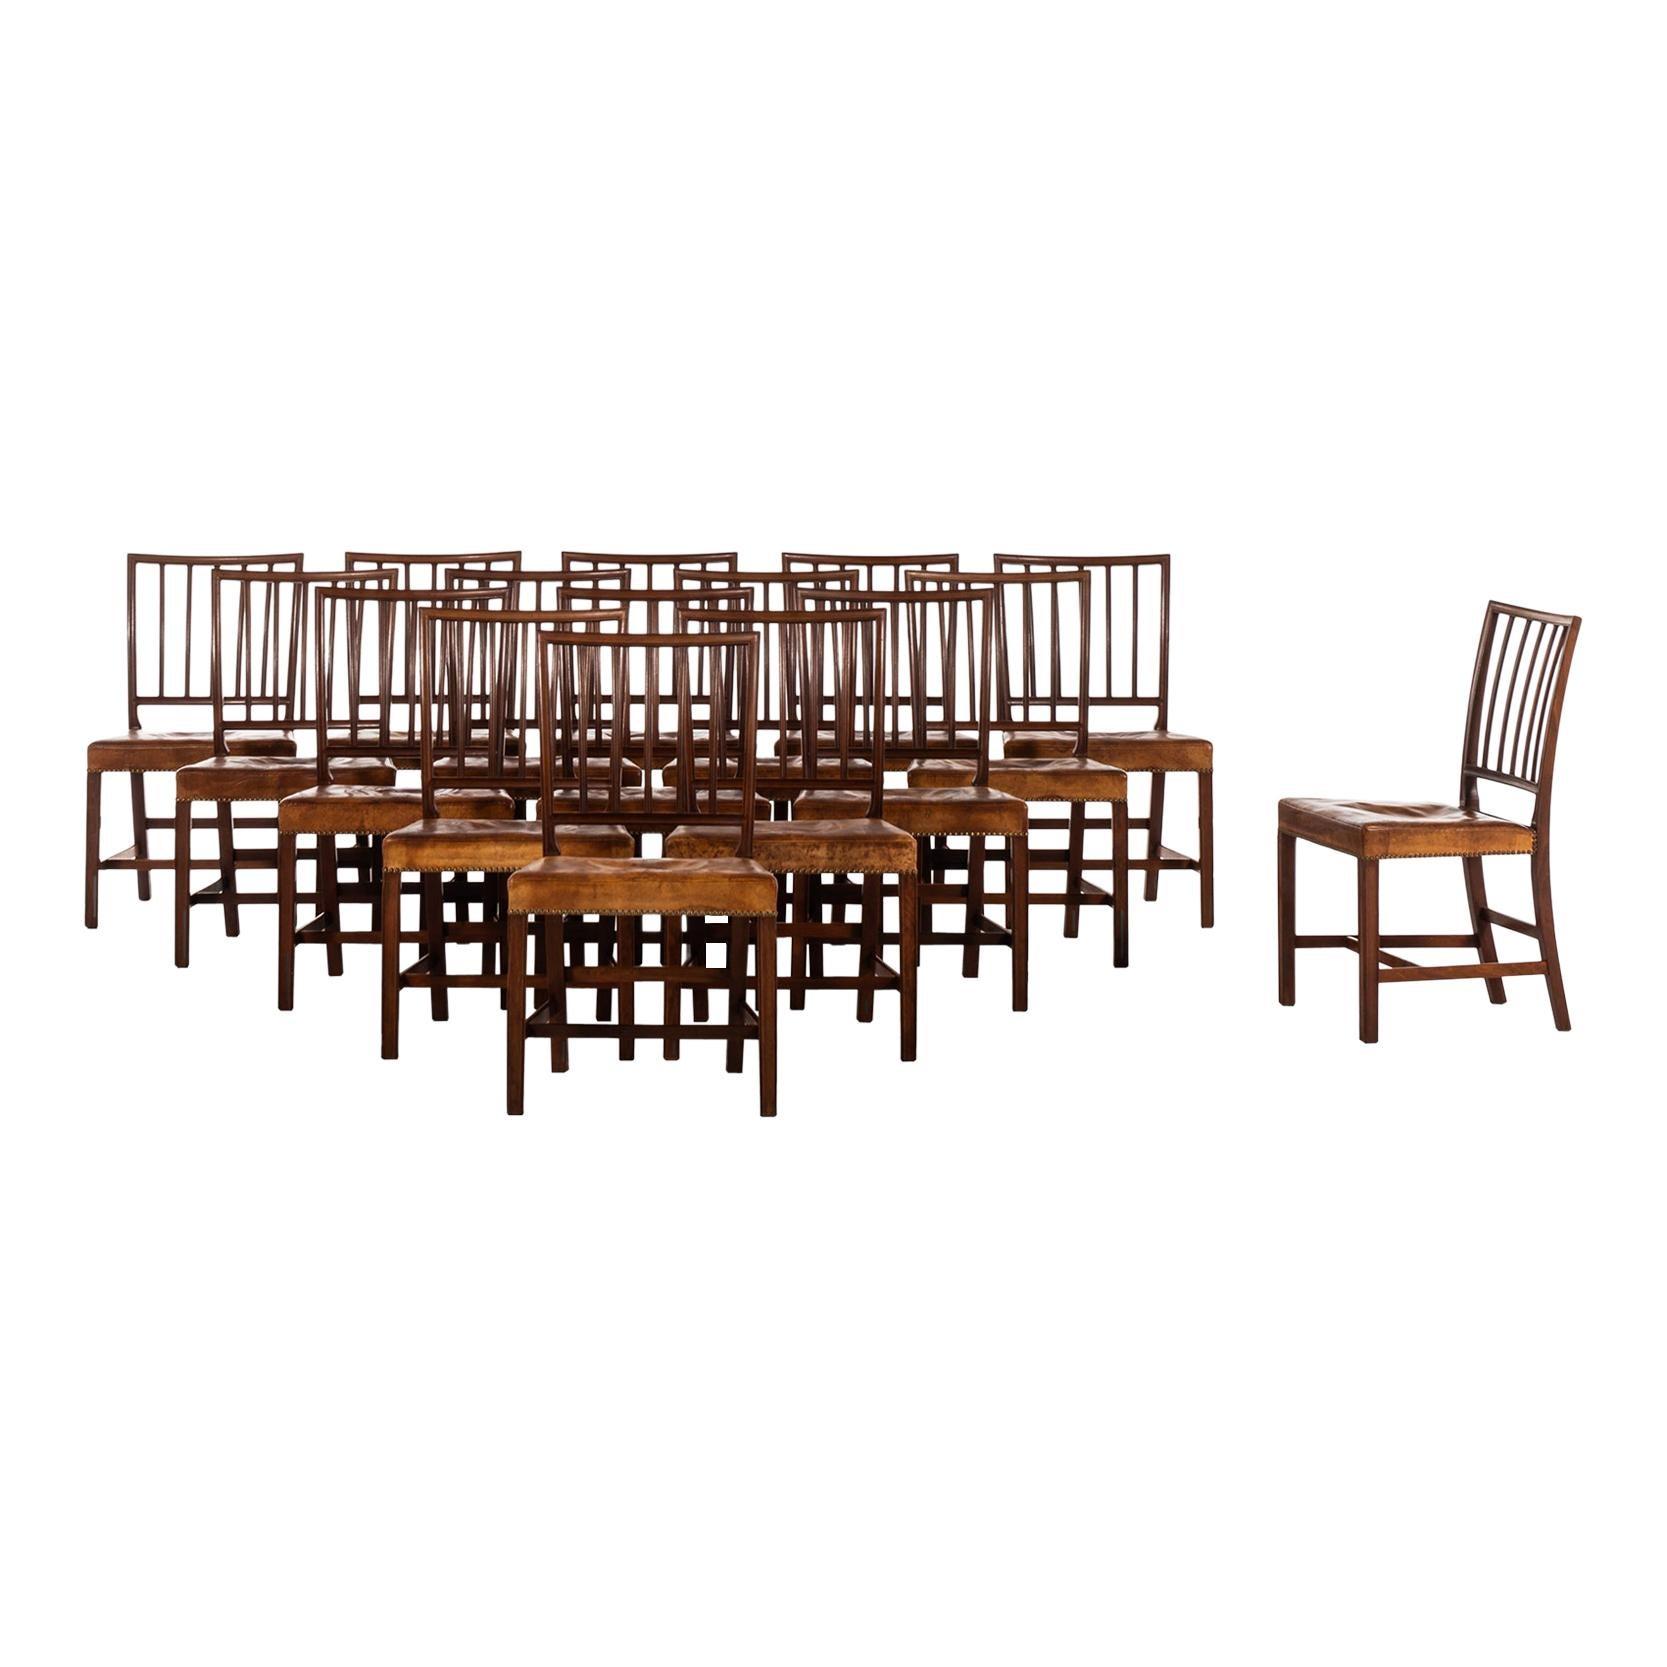 Jacob Kjær Dining Chairs Model Paris Produced by Cabinetmaker Jacob Kjær